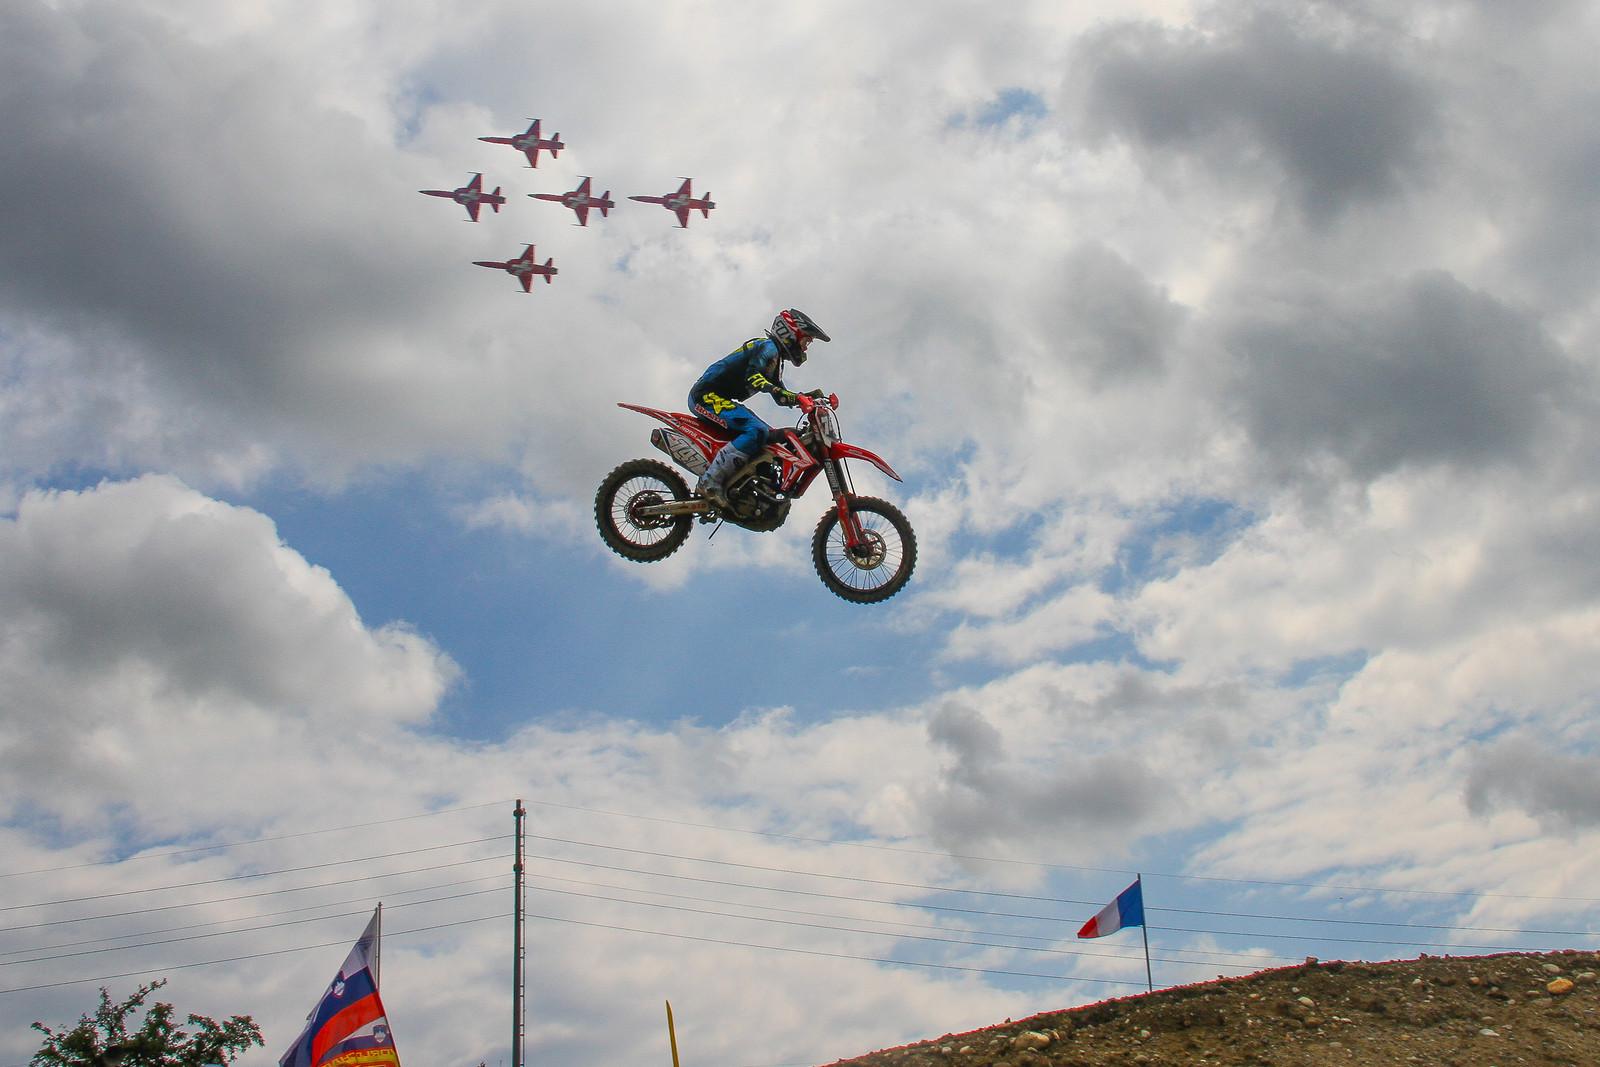 Airplanes - ayearinmx - Motocross Pictures - Vital MX